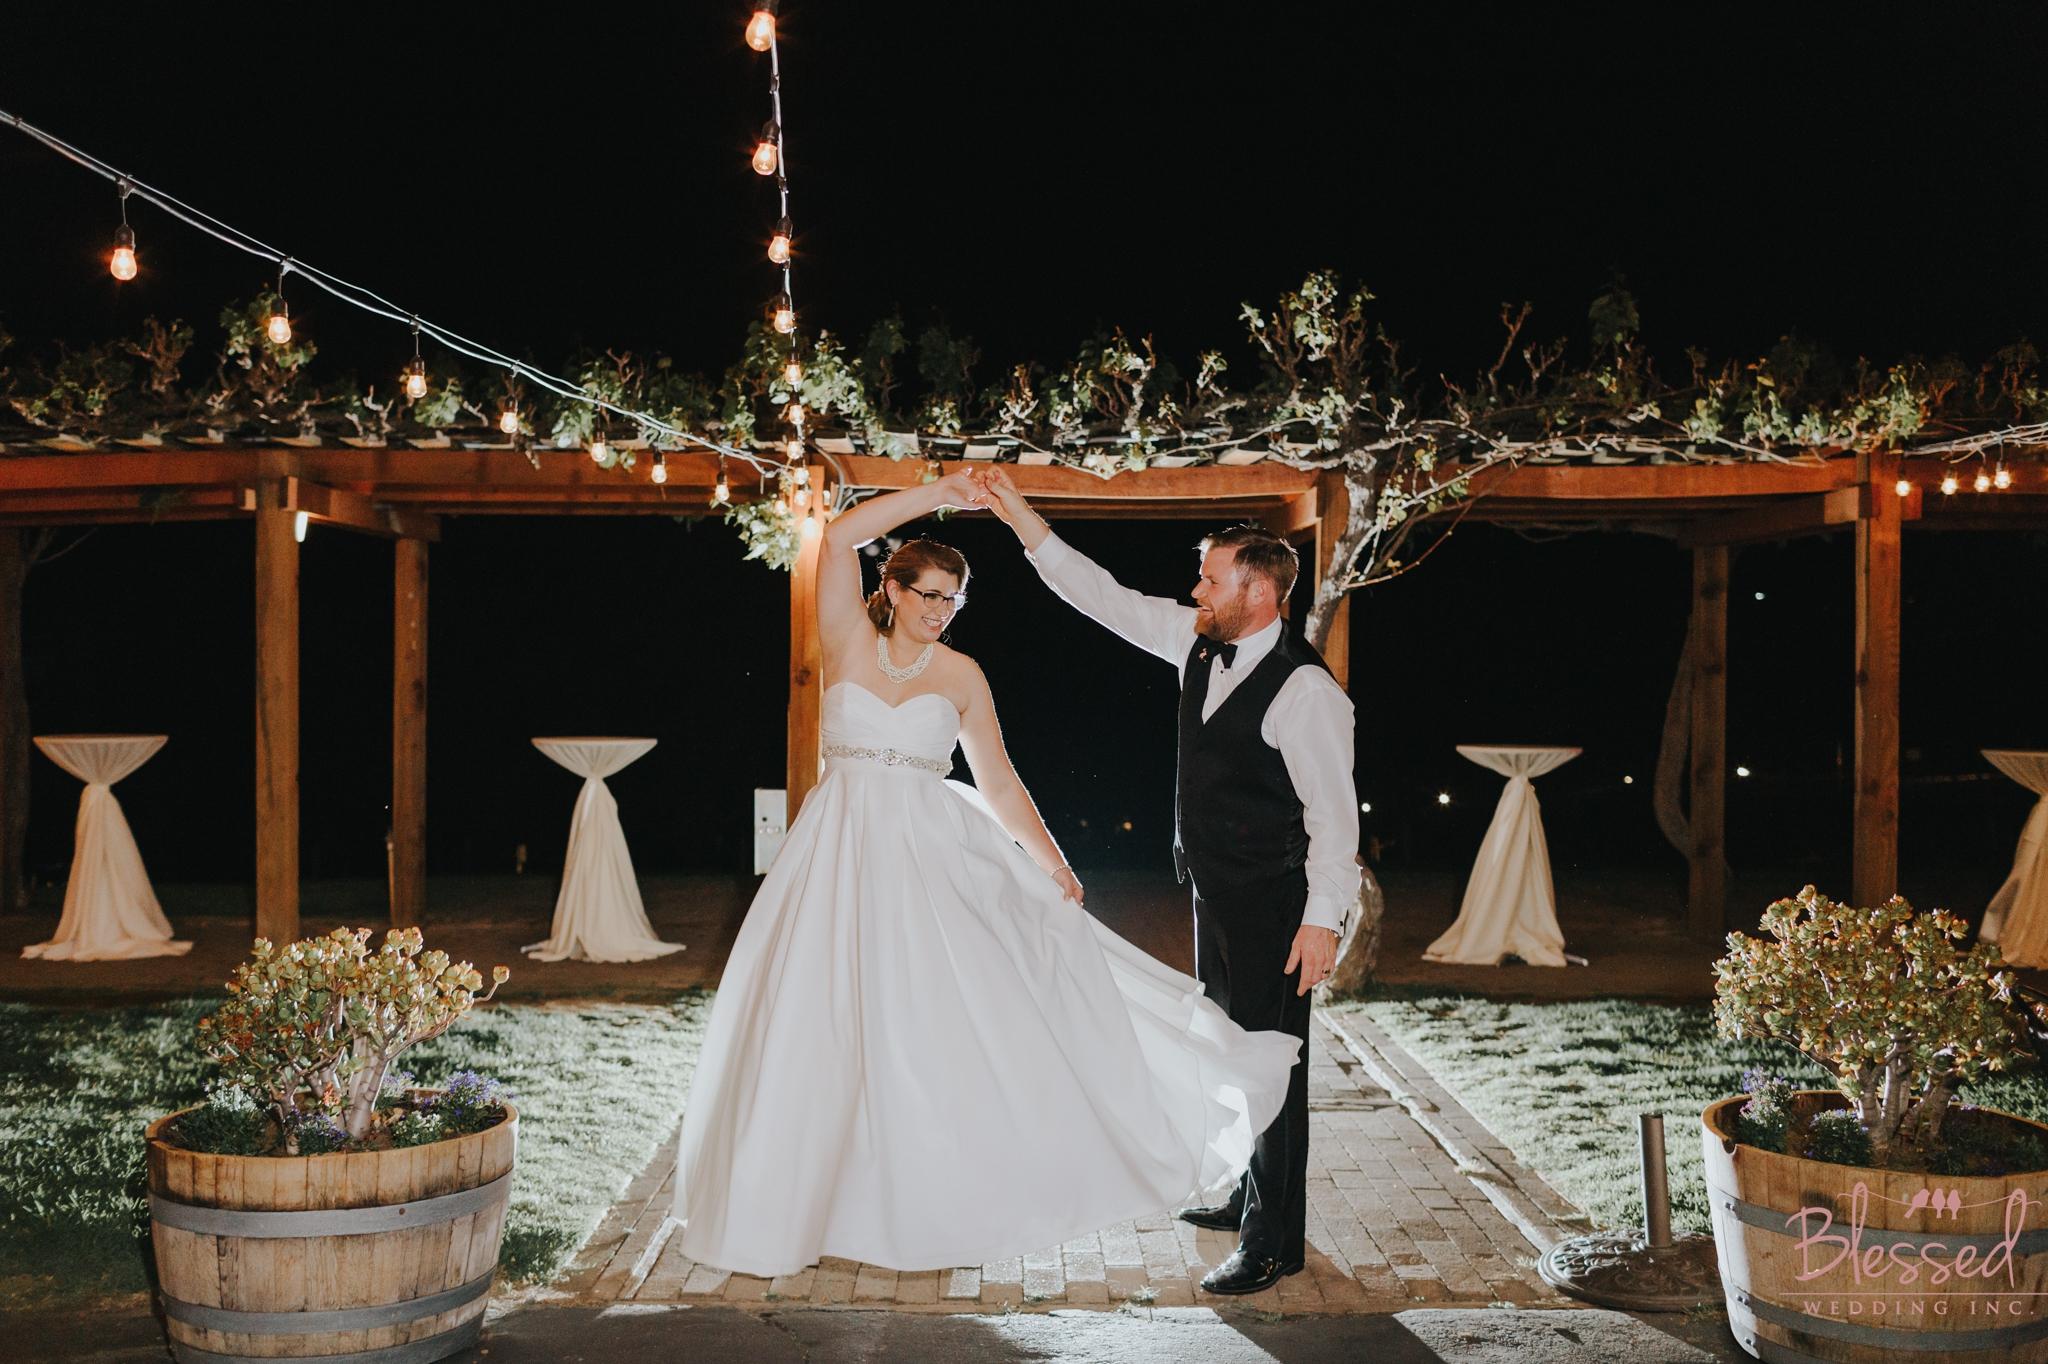 Orfila Vinery Wedding by Blessed Wedding Photography 43.jpg